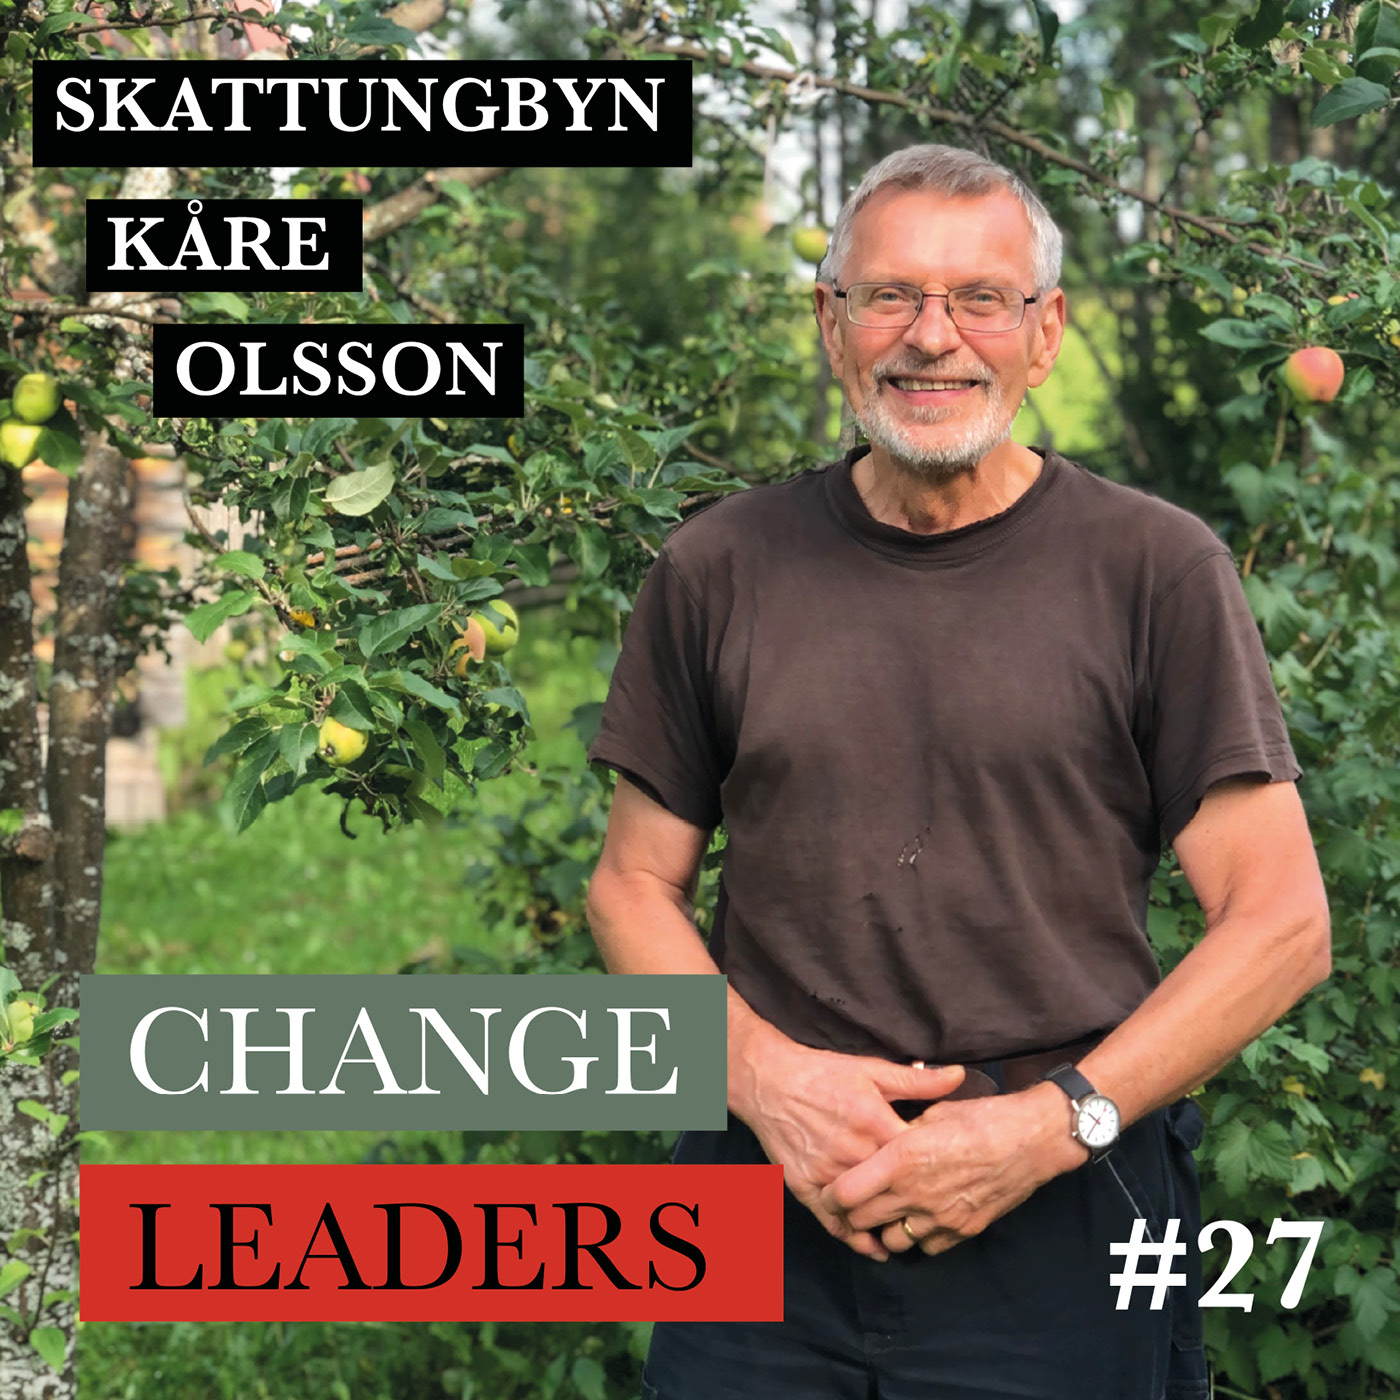 #27 Skattungbyn del 2 - Kåre Olsson